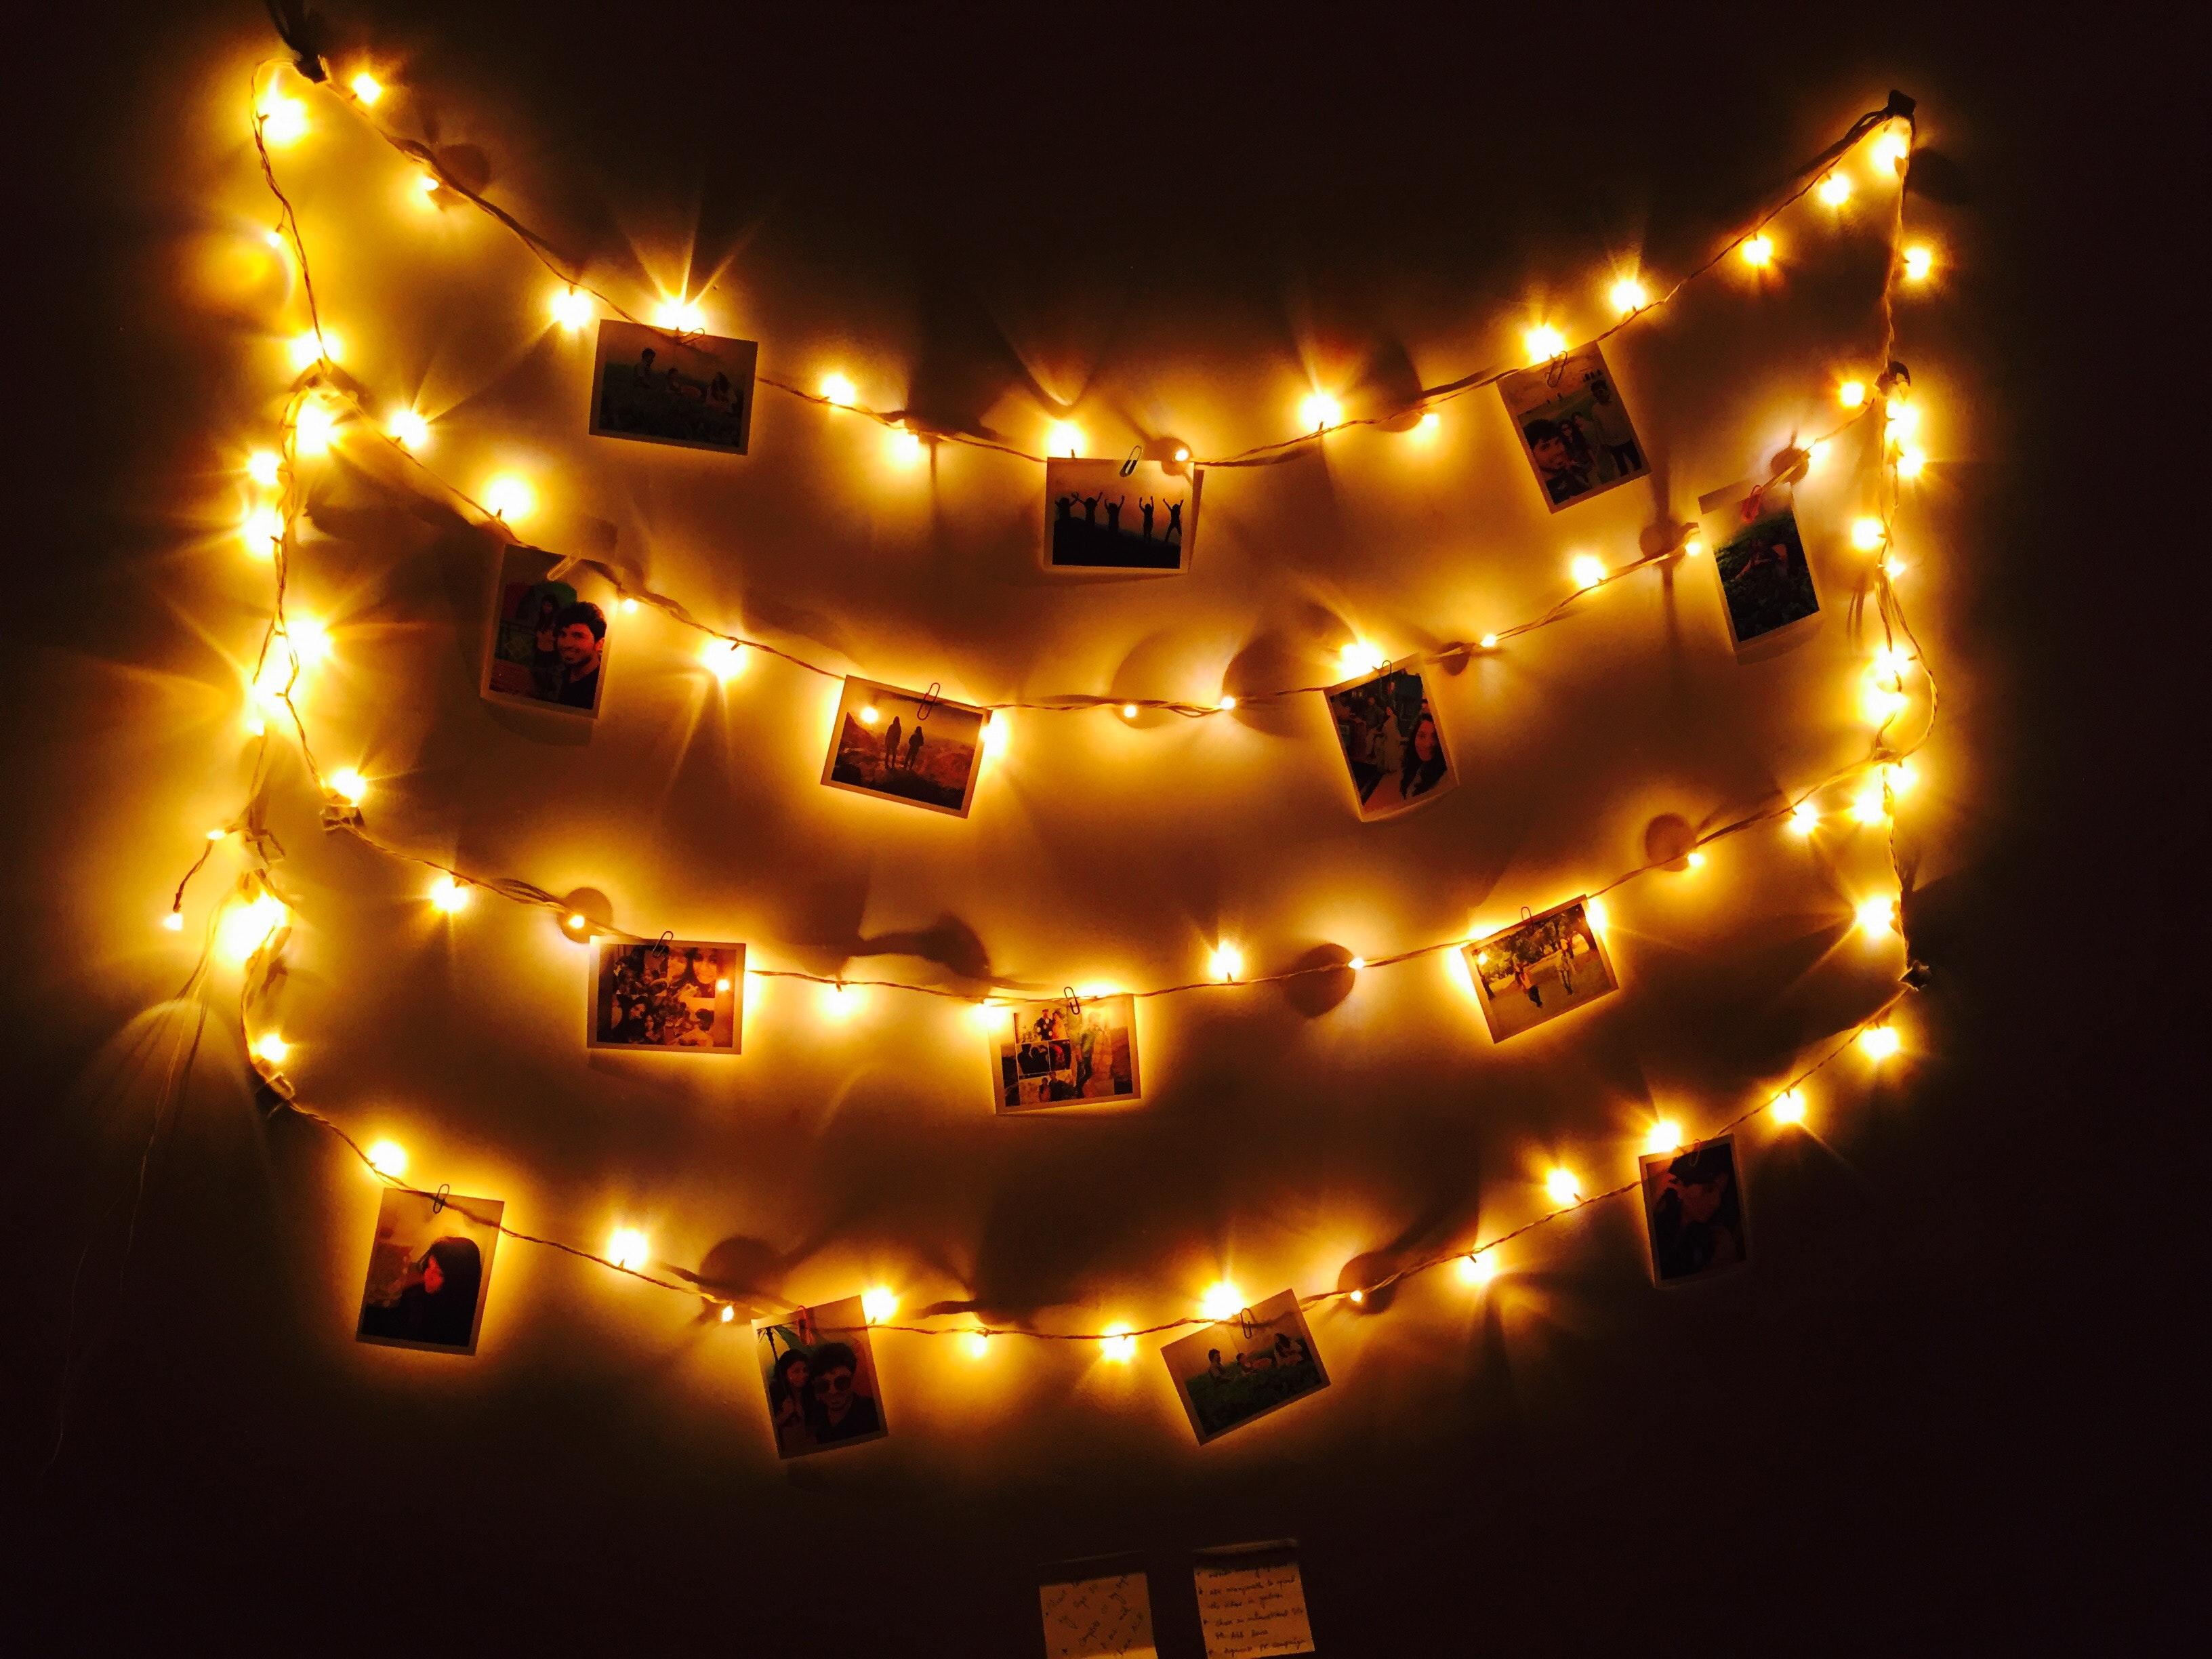 Free Images Light Lighting Decor